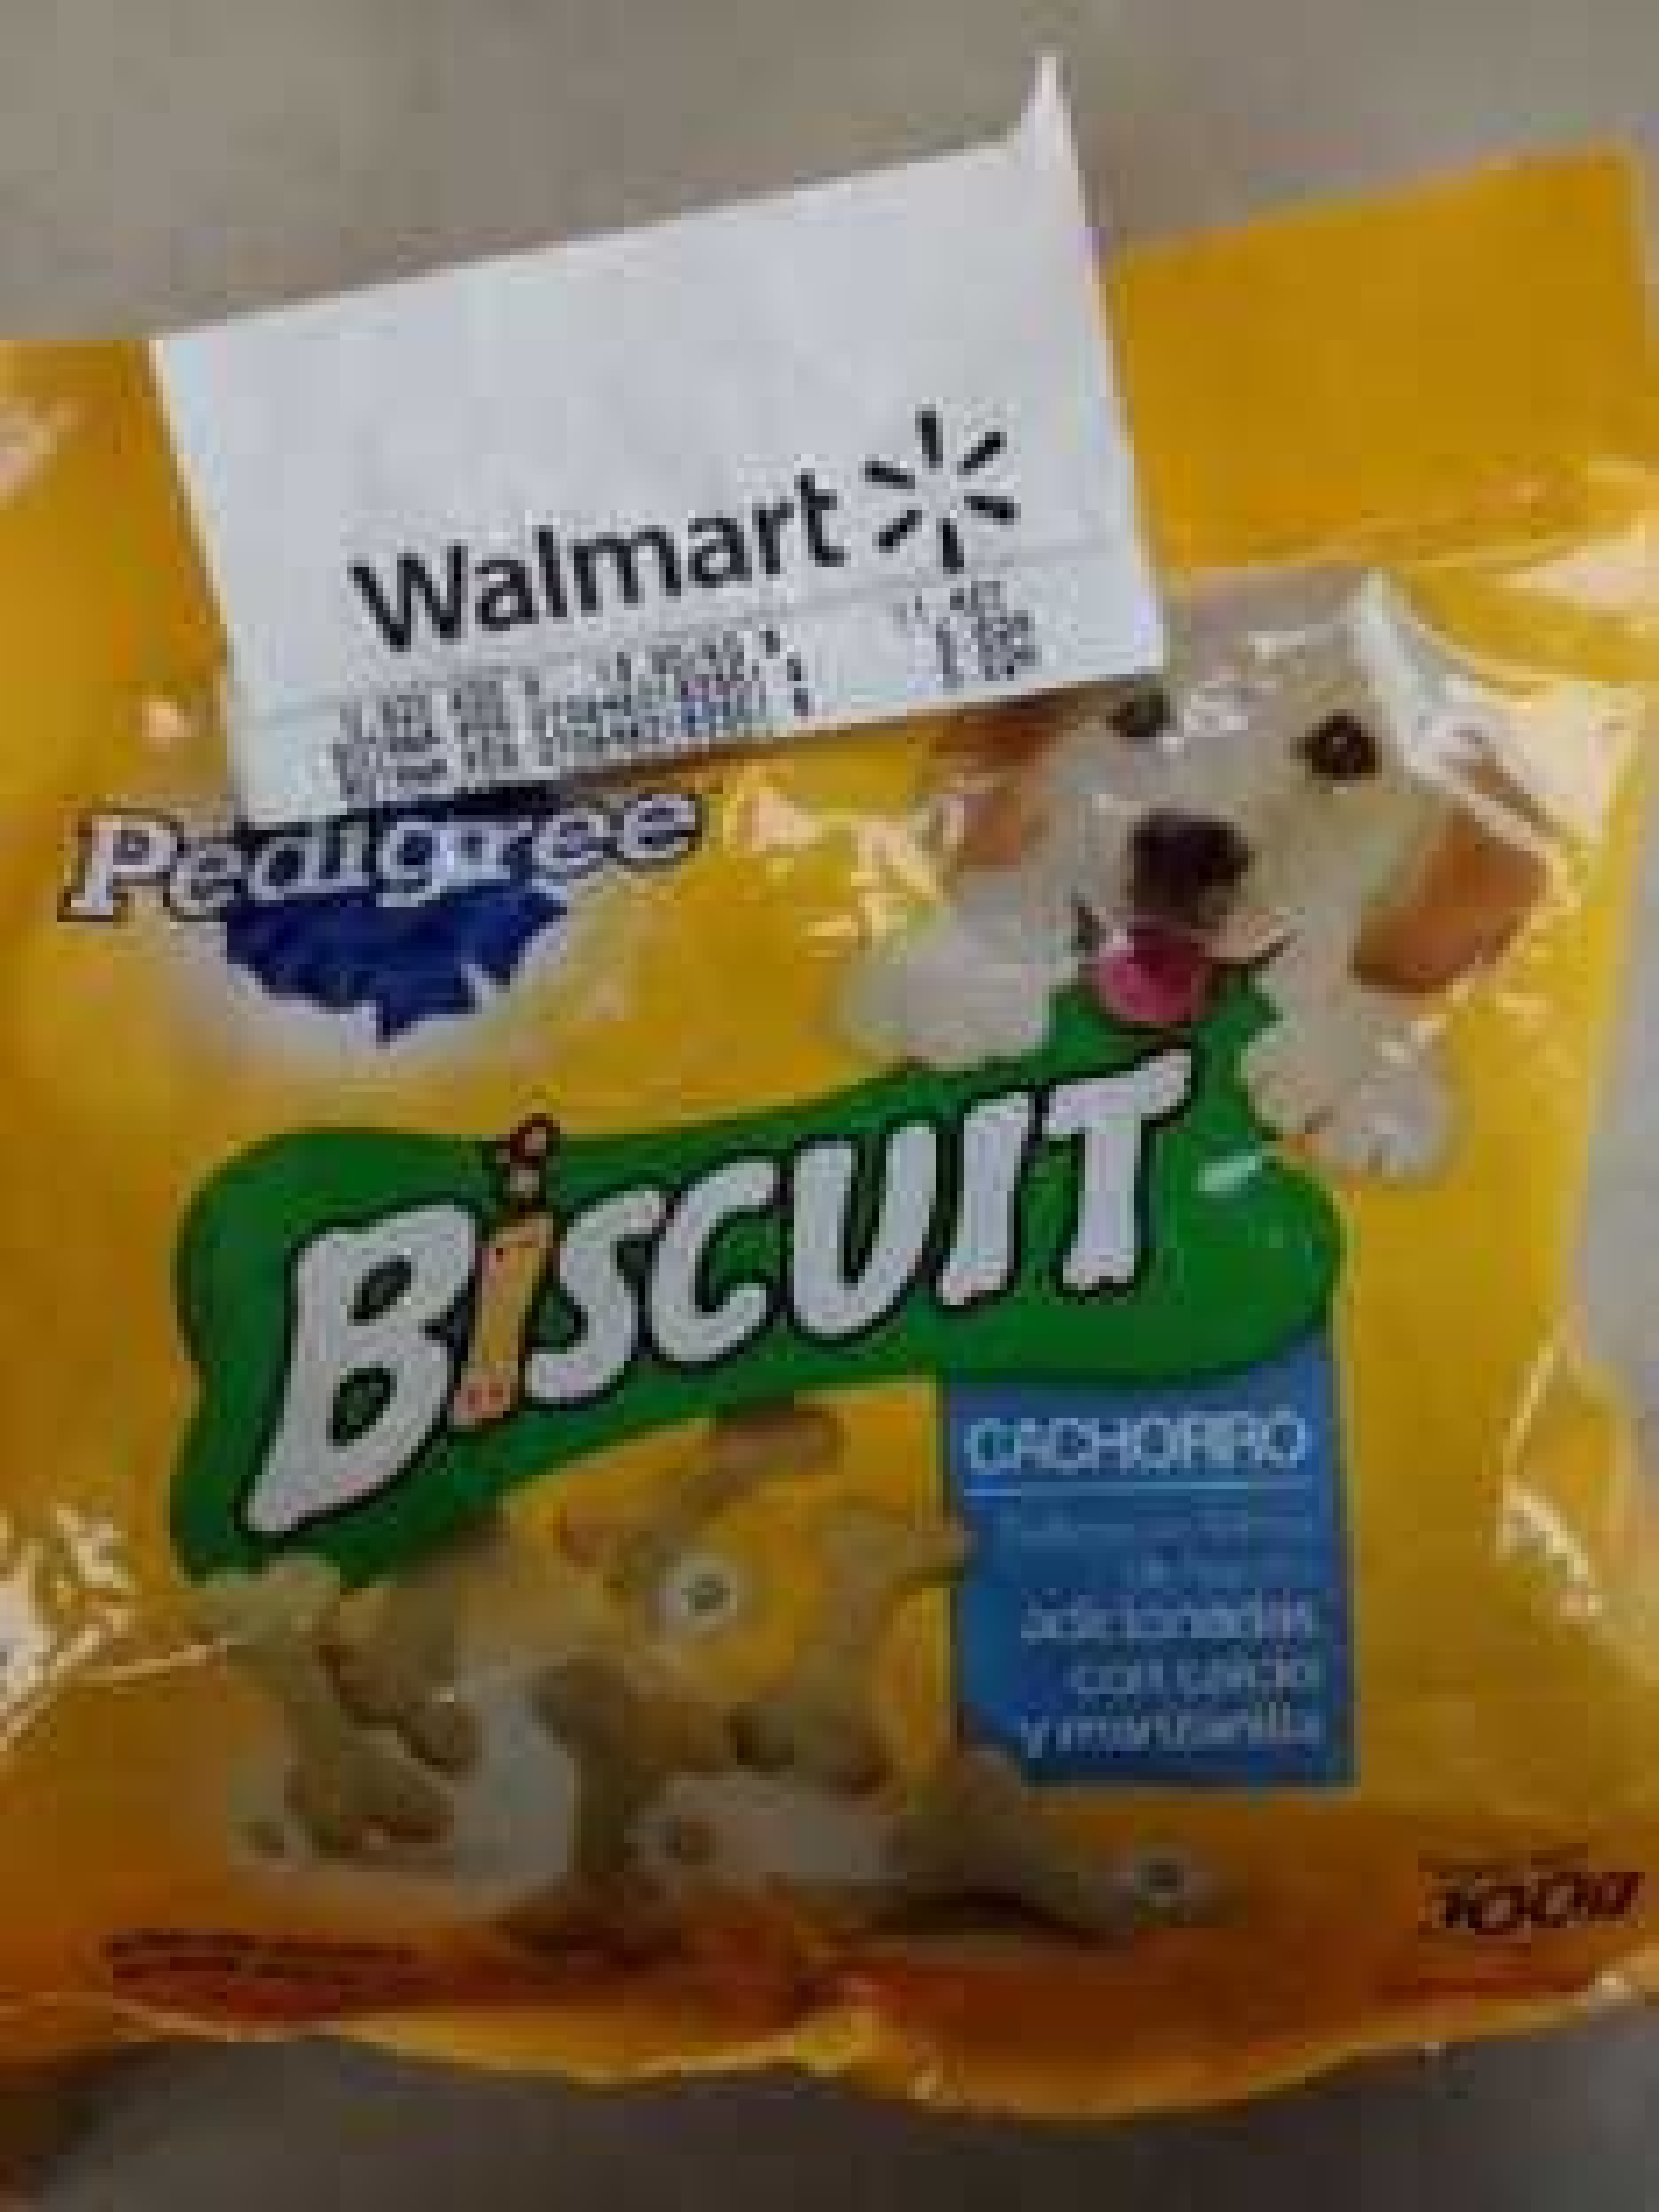 Walmart: Biscuit Pedigree para Cachorro a 5.02